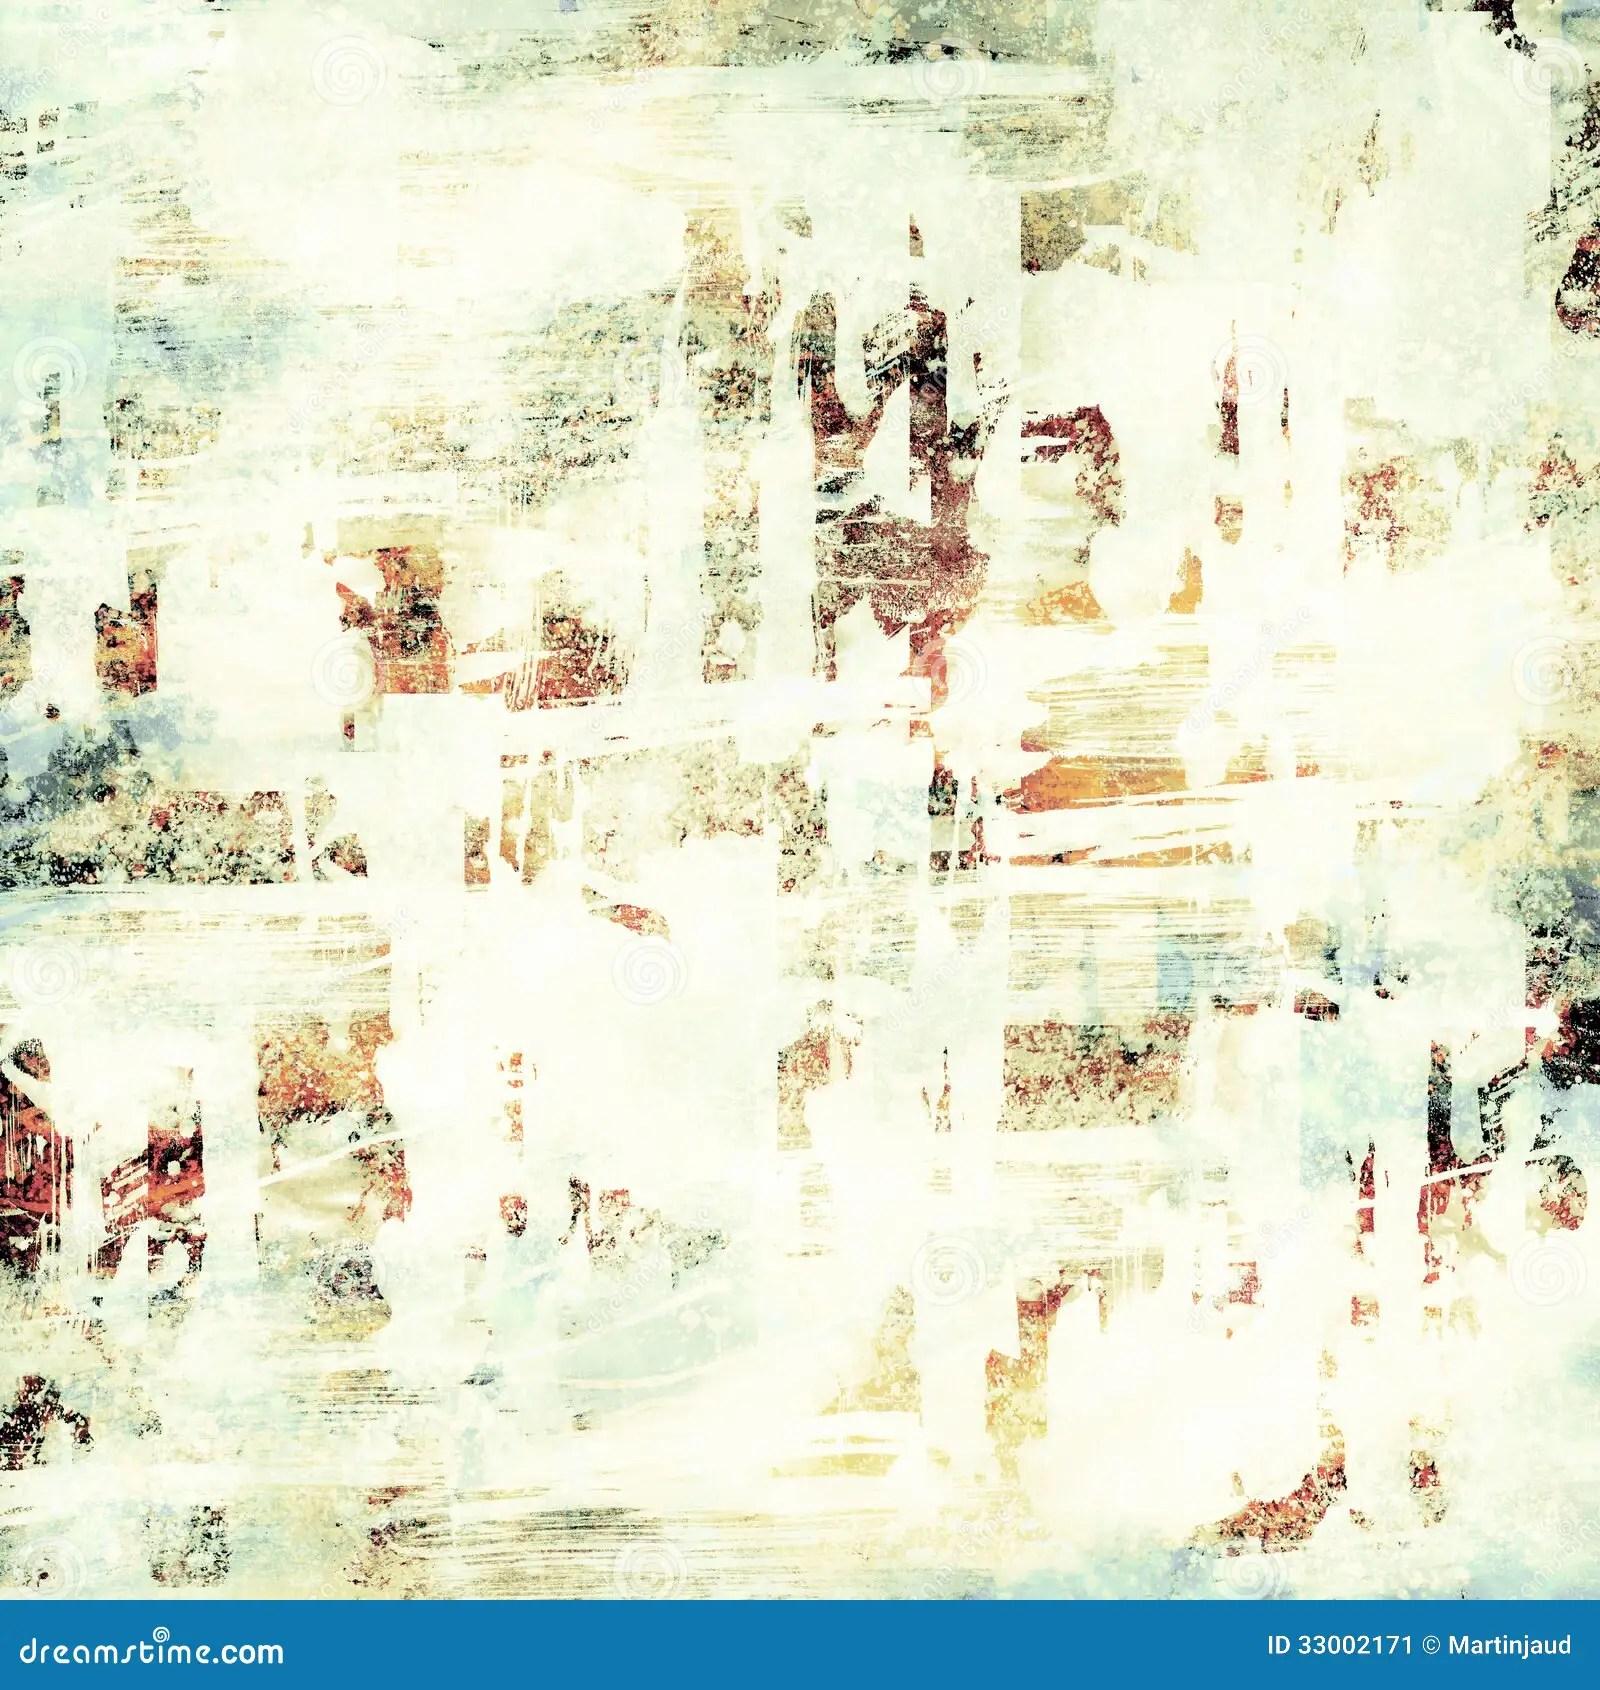 Artistic Summertime Paper Background Design Stock Image